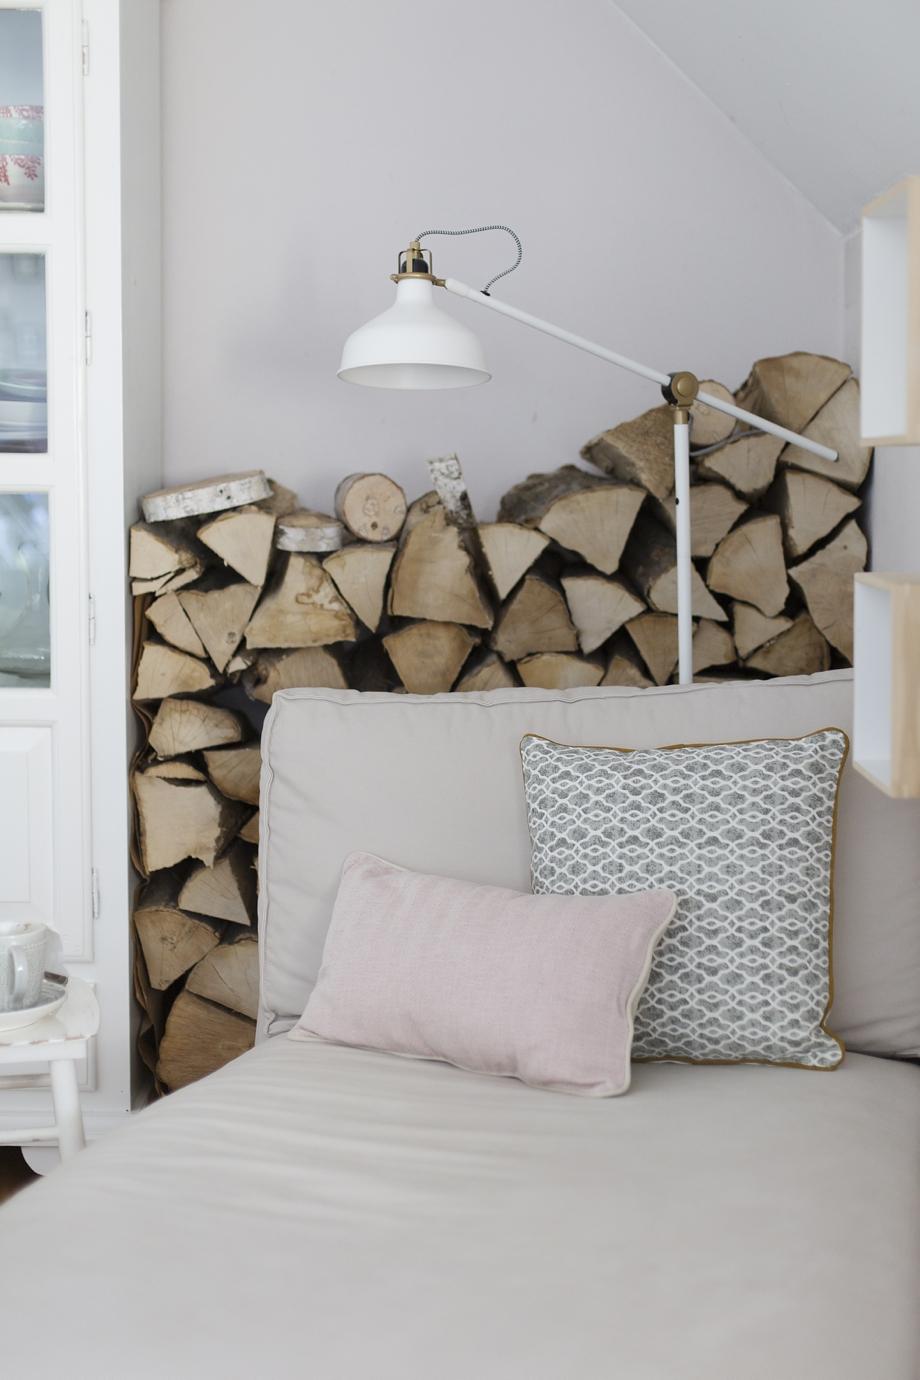 gem tlich in den herbst i sch n bei dir by depot. Black Bedroom Furniture Sets. Home Design Ideas